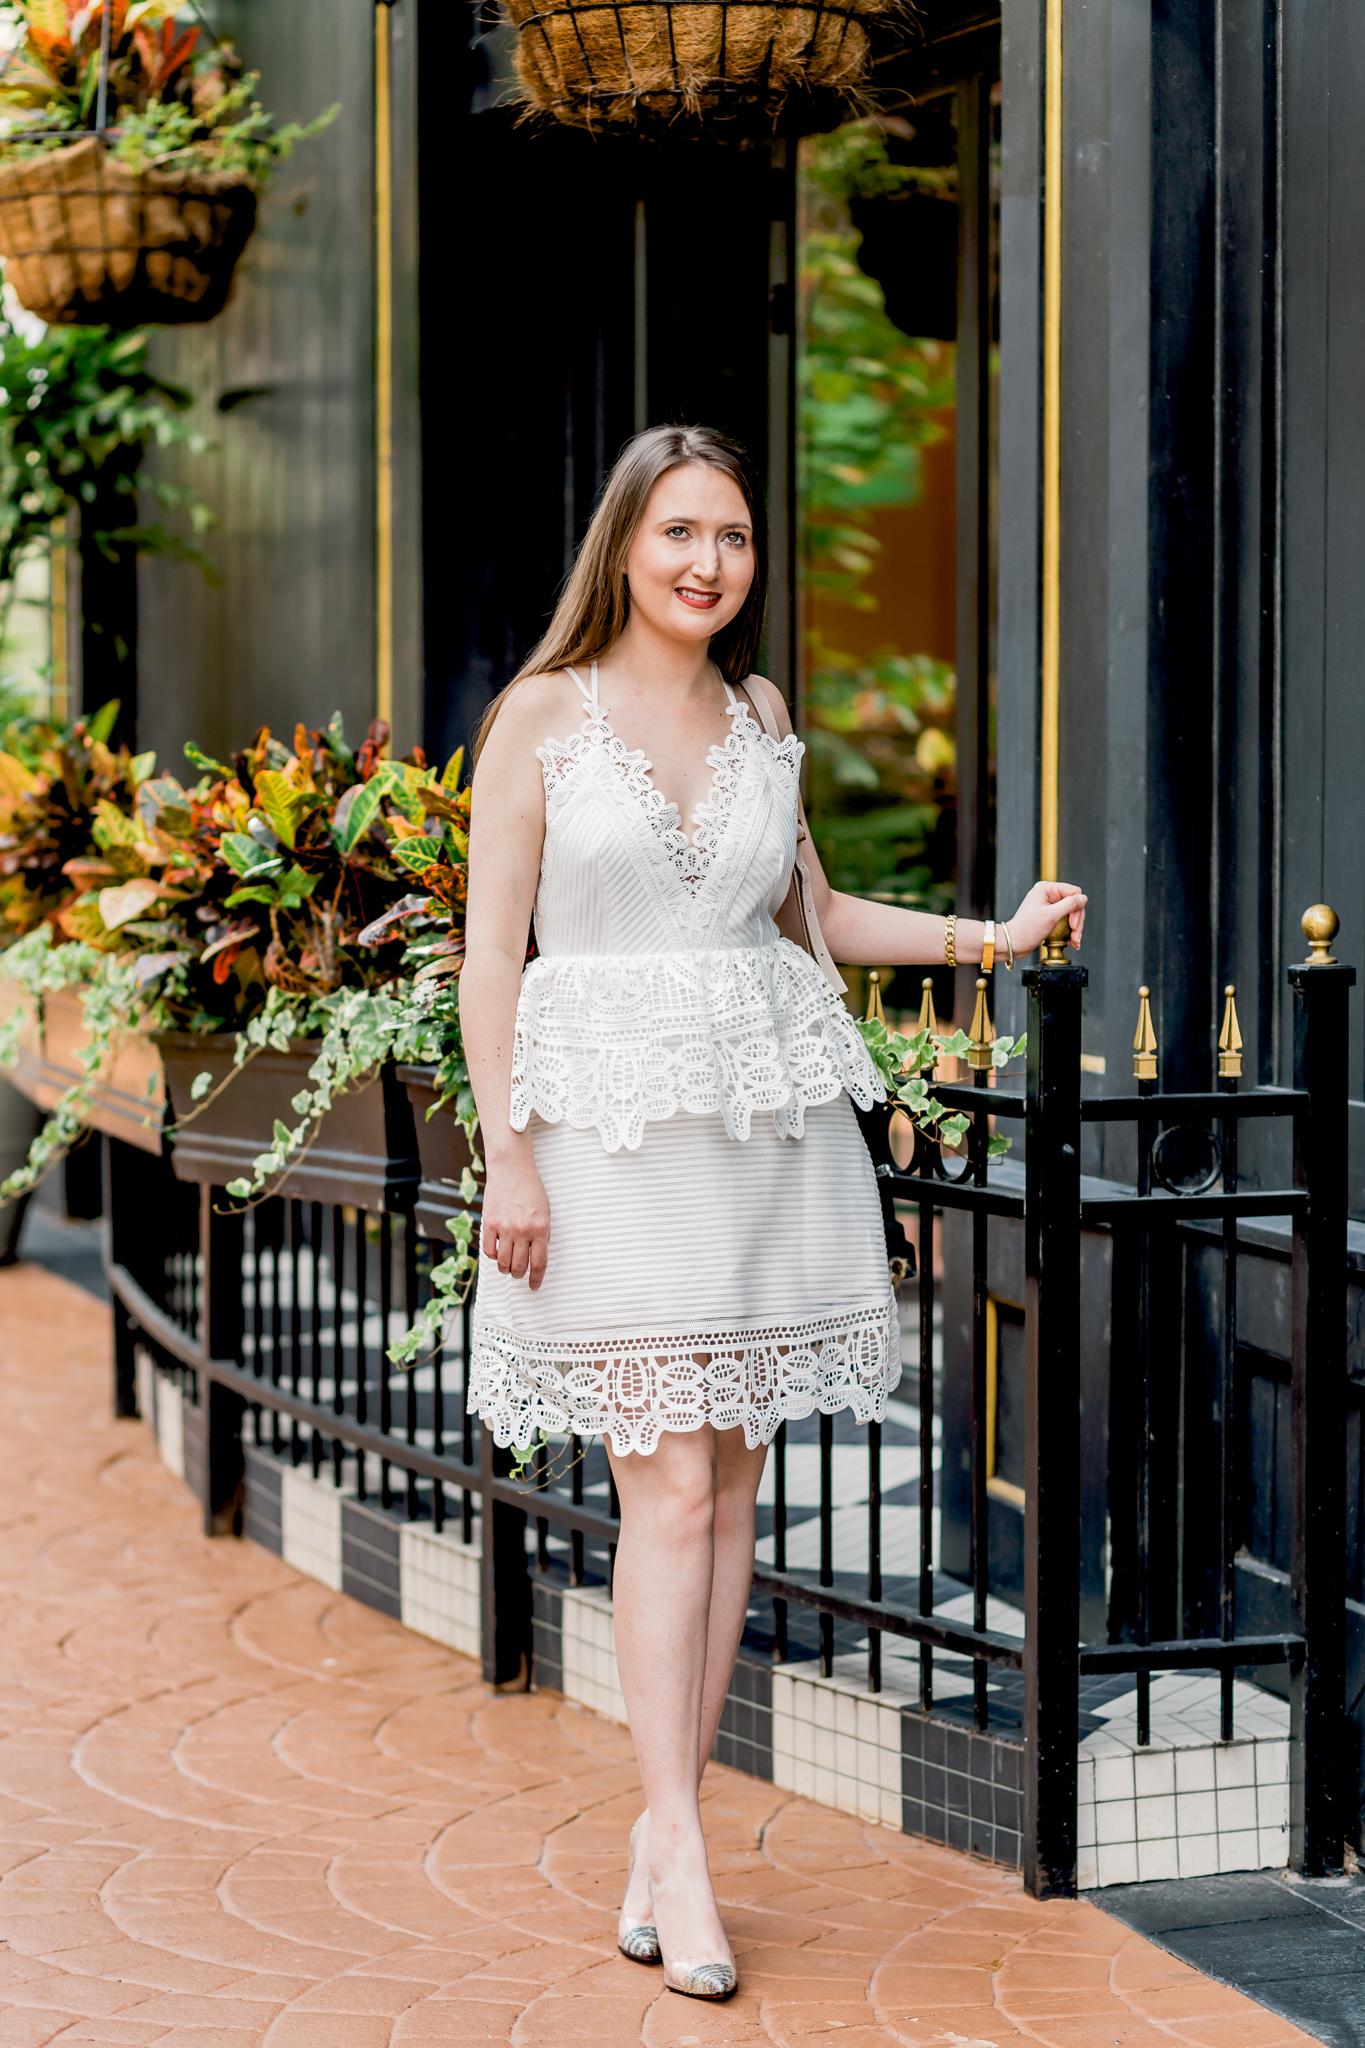 peplum dress, white dress, self-portrait, self-portrait dress, self-portrait peplum dress, chloe marcie mini, christian louboutin, louboutin glitter heels